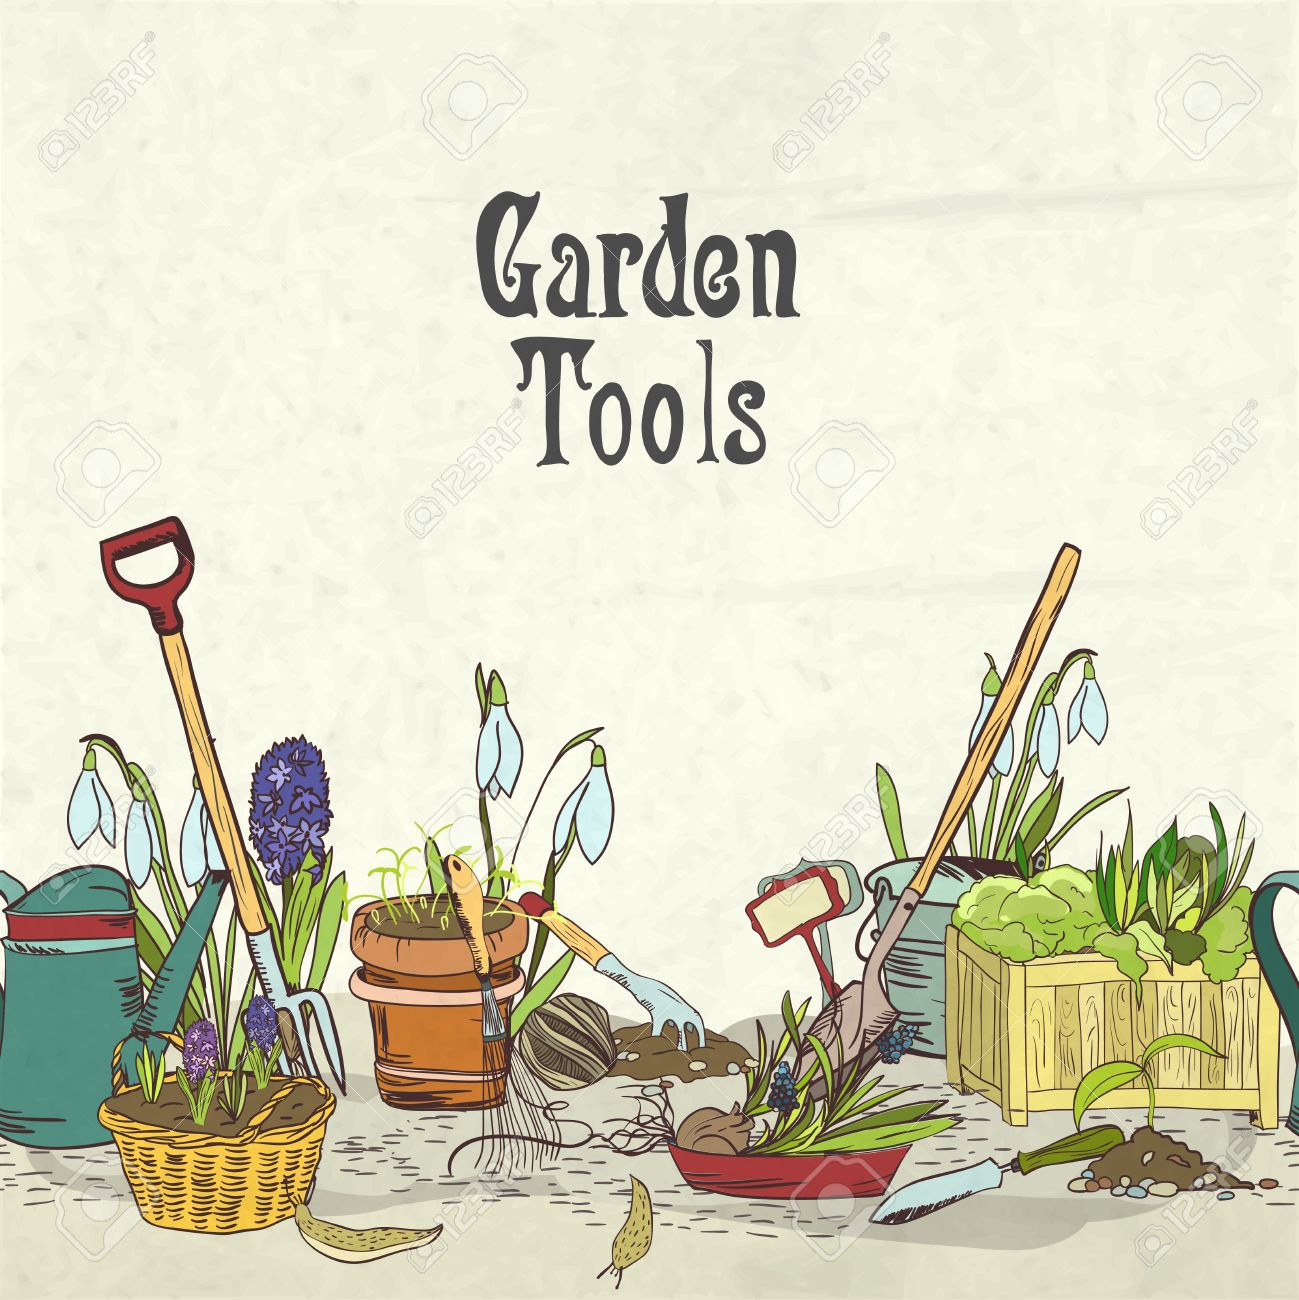 Vegetable garden border clipart vegetable garden border - Hand Drawn Gardening Tools Album Cover Border Or Frame For Plants Flowers Farming And Agriculture Illustration